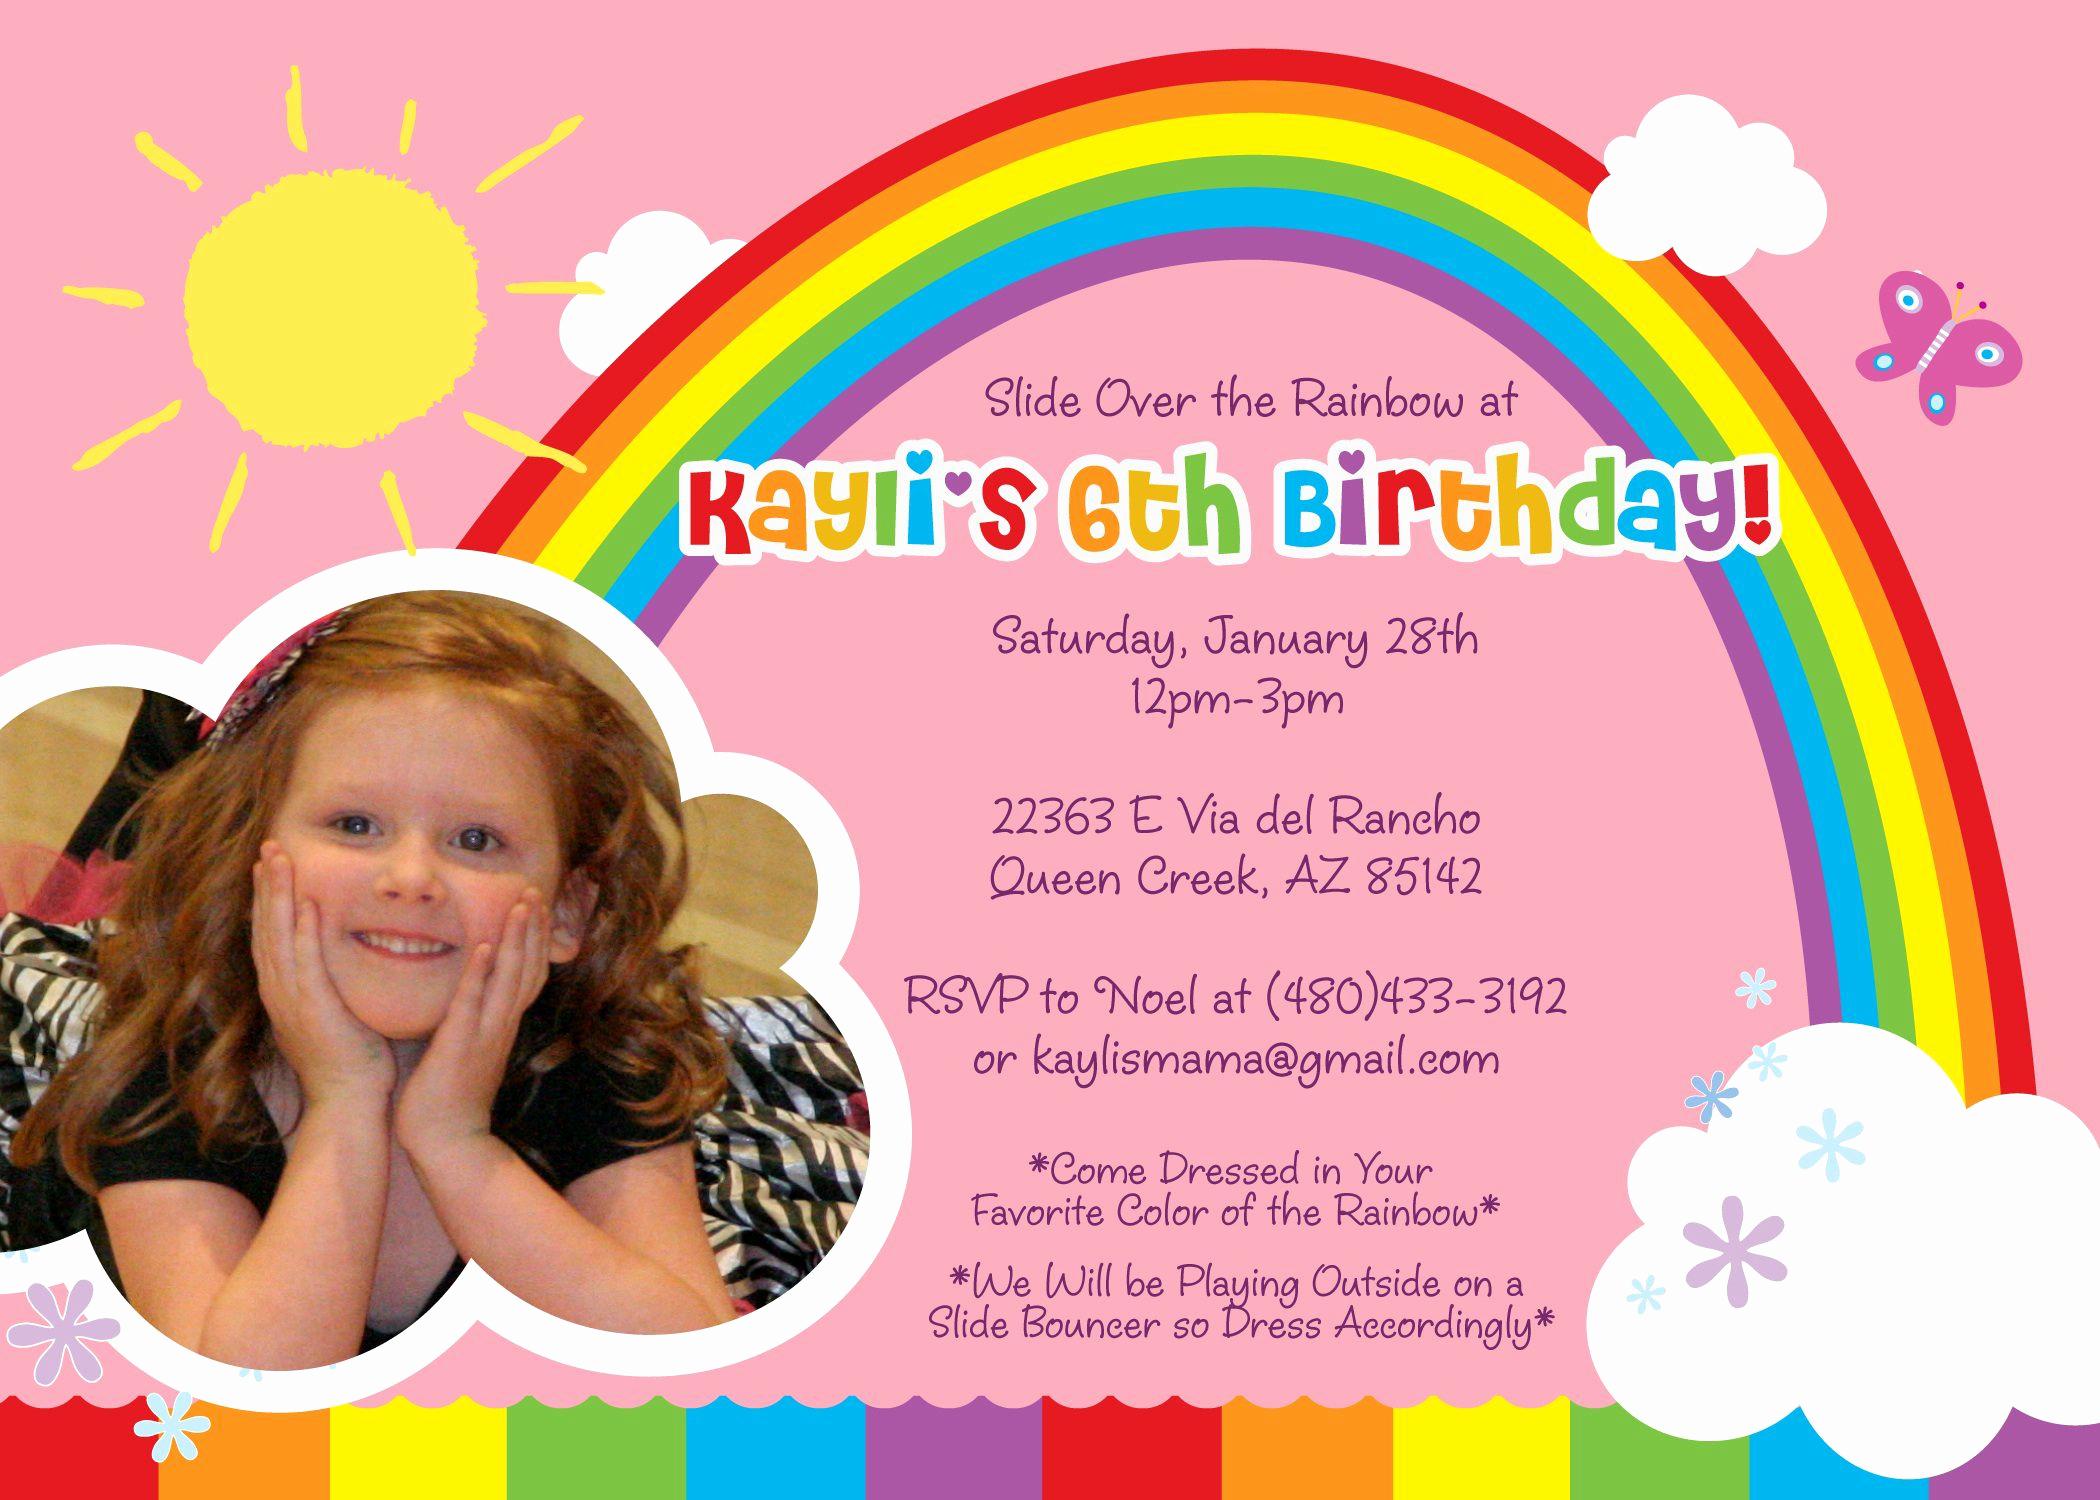 Invitation Template Google Docs Lovely Birthday Party Invitation Template Birthday Party